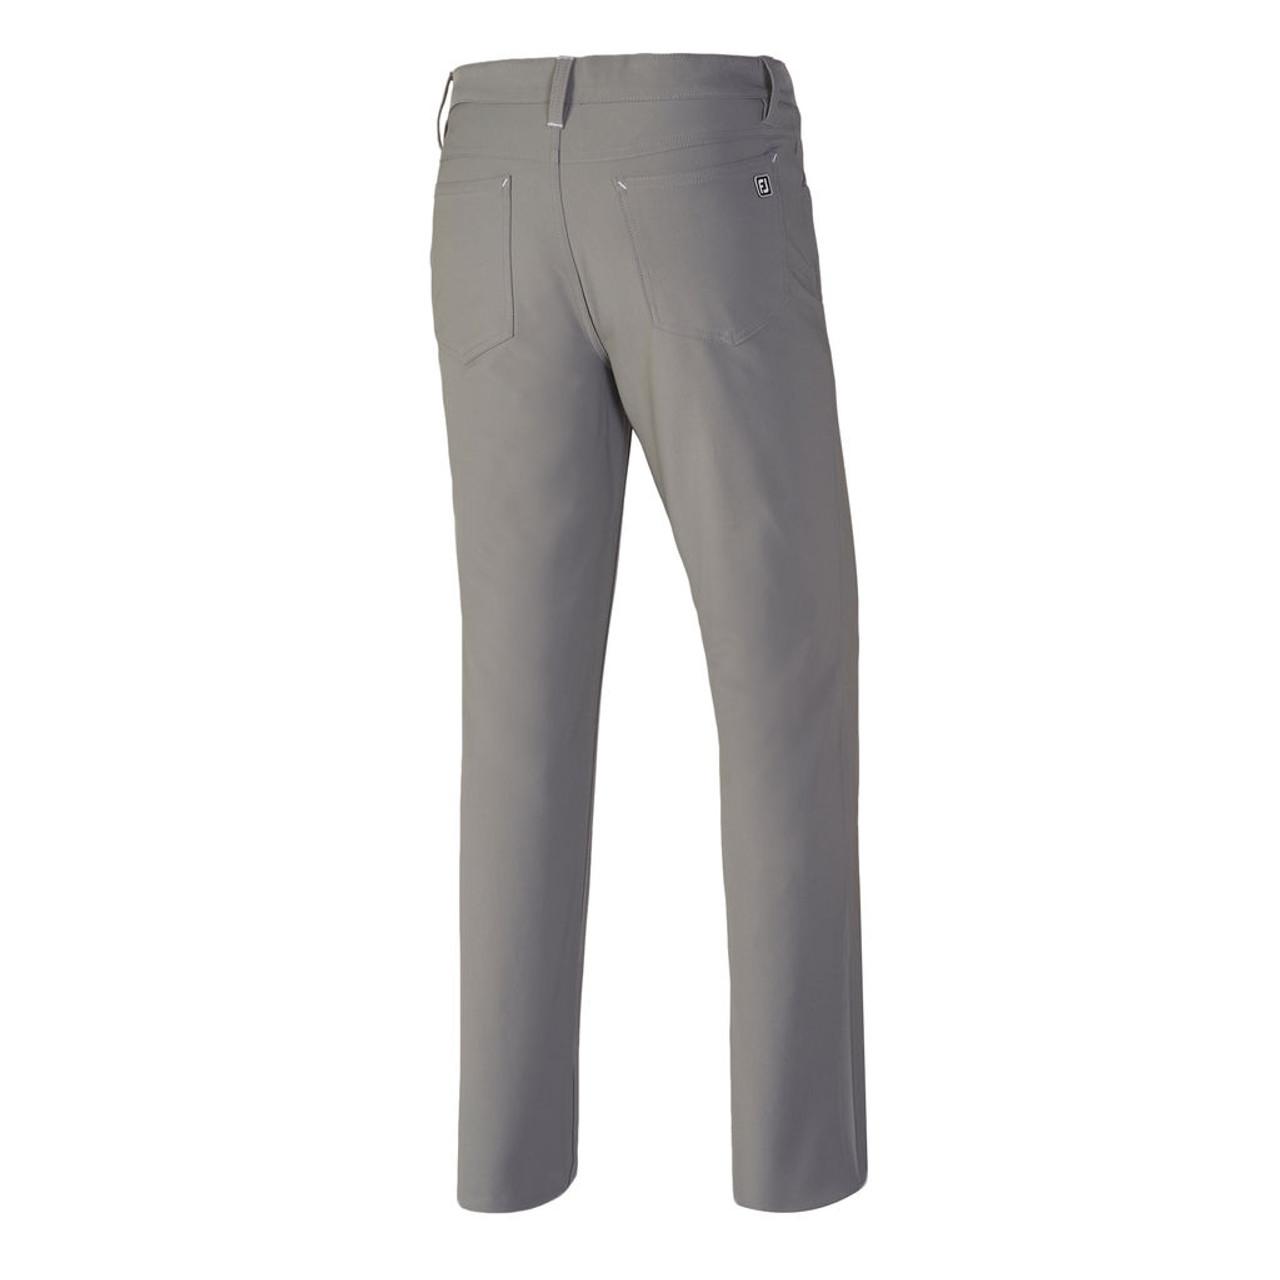 FootJoy Athletic Fit Performance 5-Pocket Pants - Grey (24354)